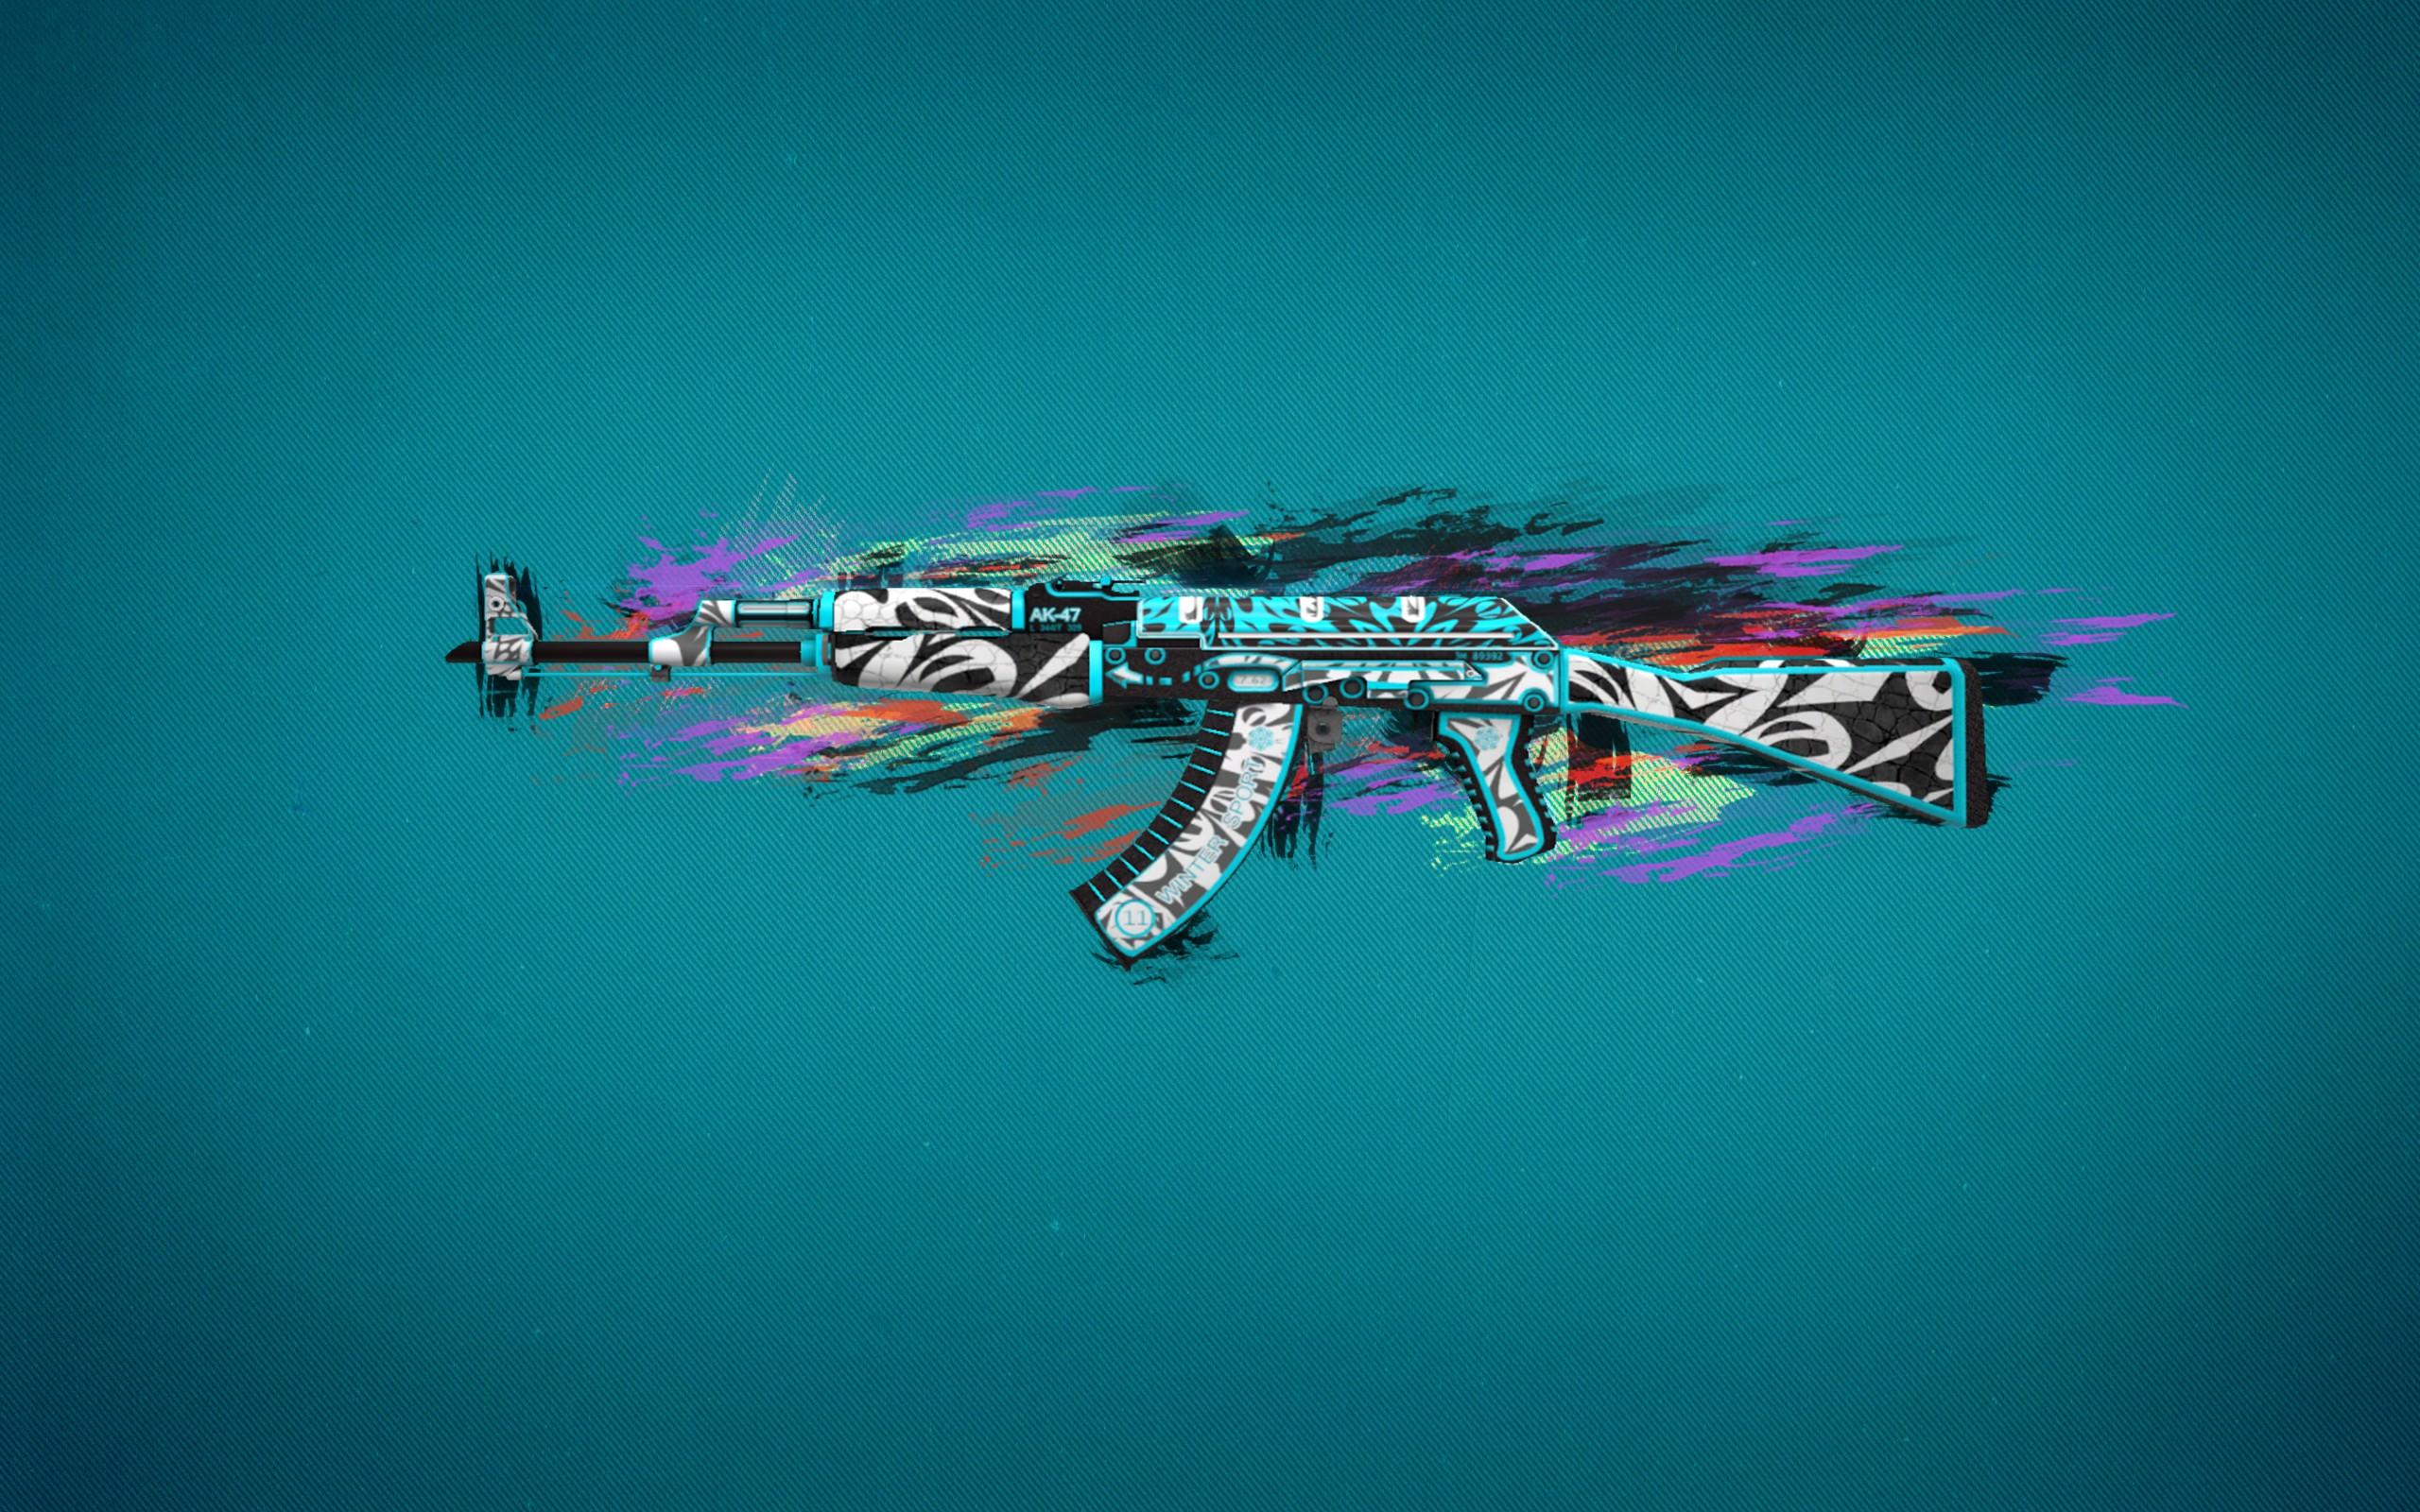 Ak47 Colorful Art 2048x1152 Resolution